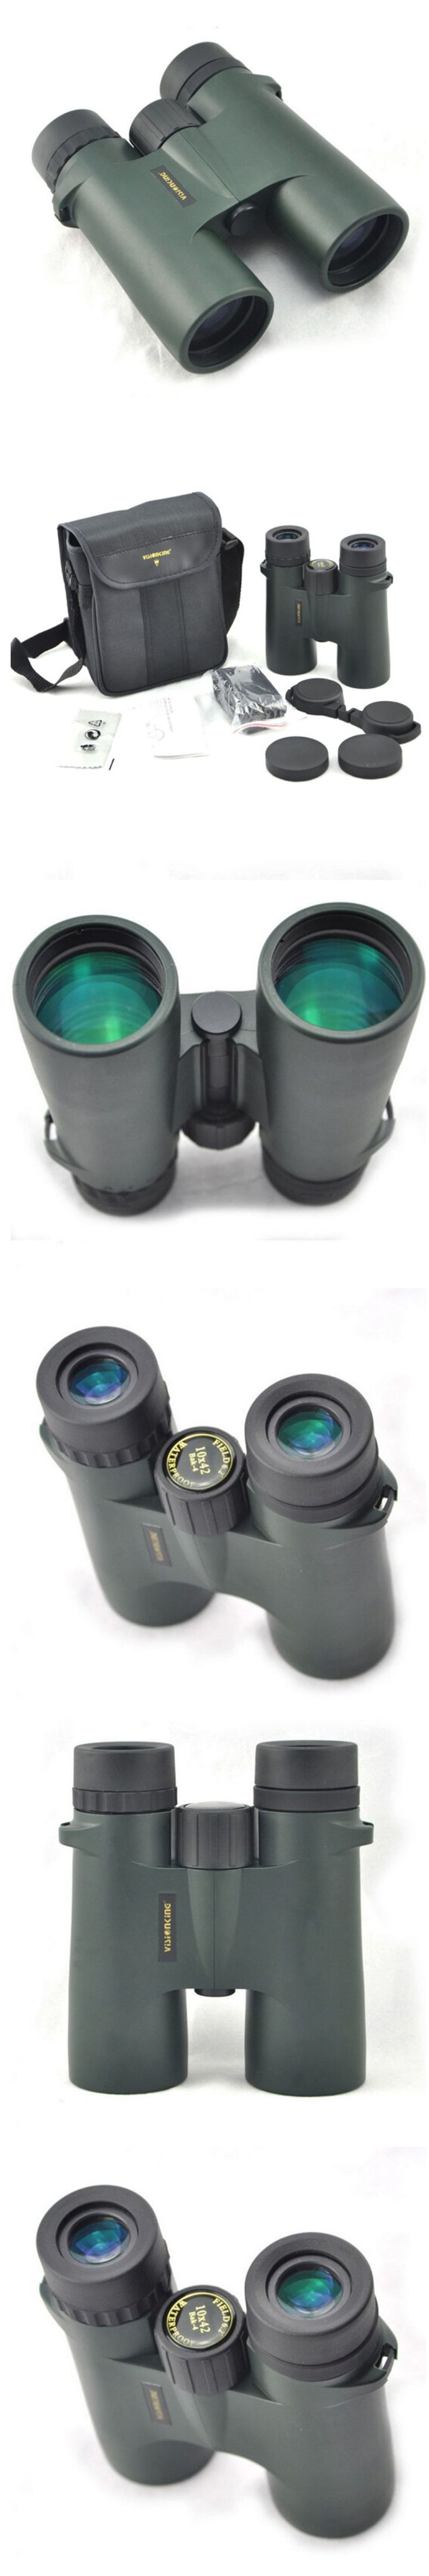 Visionking 10x42 Waterproof Bak4 Telescope Travelling/Hunting/Birdwatching Binoculo Profissional Prismaticos De Caza  Binoculars